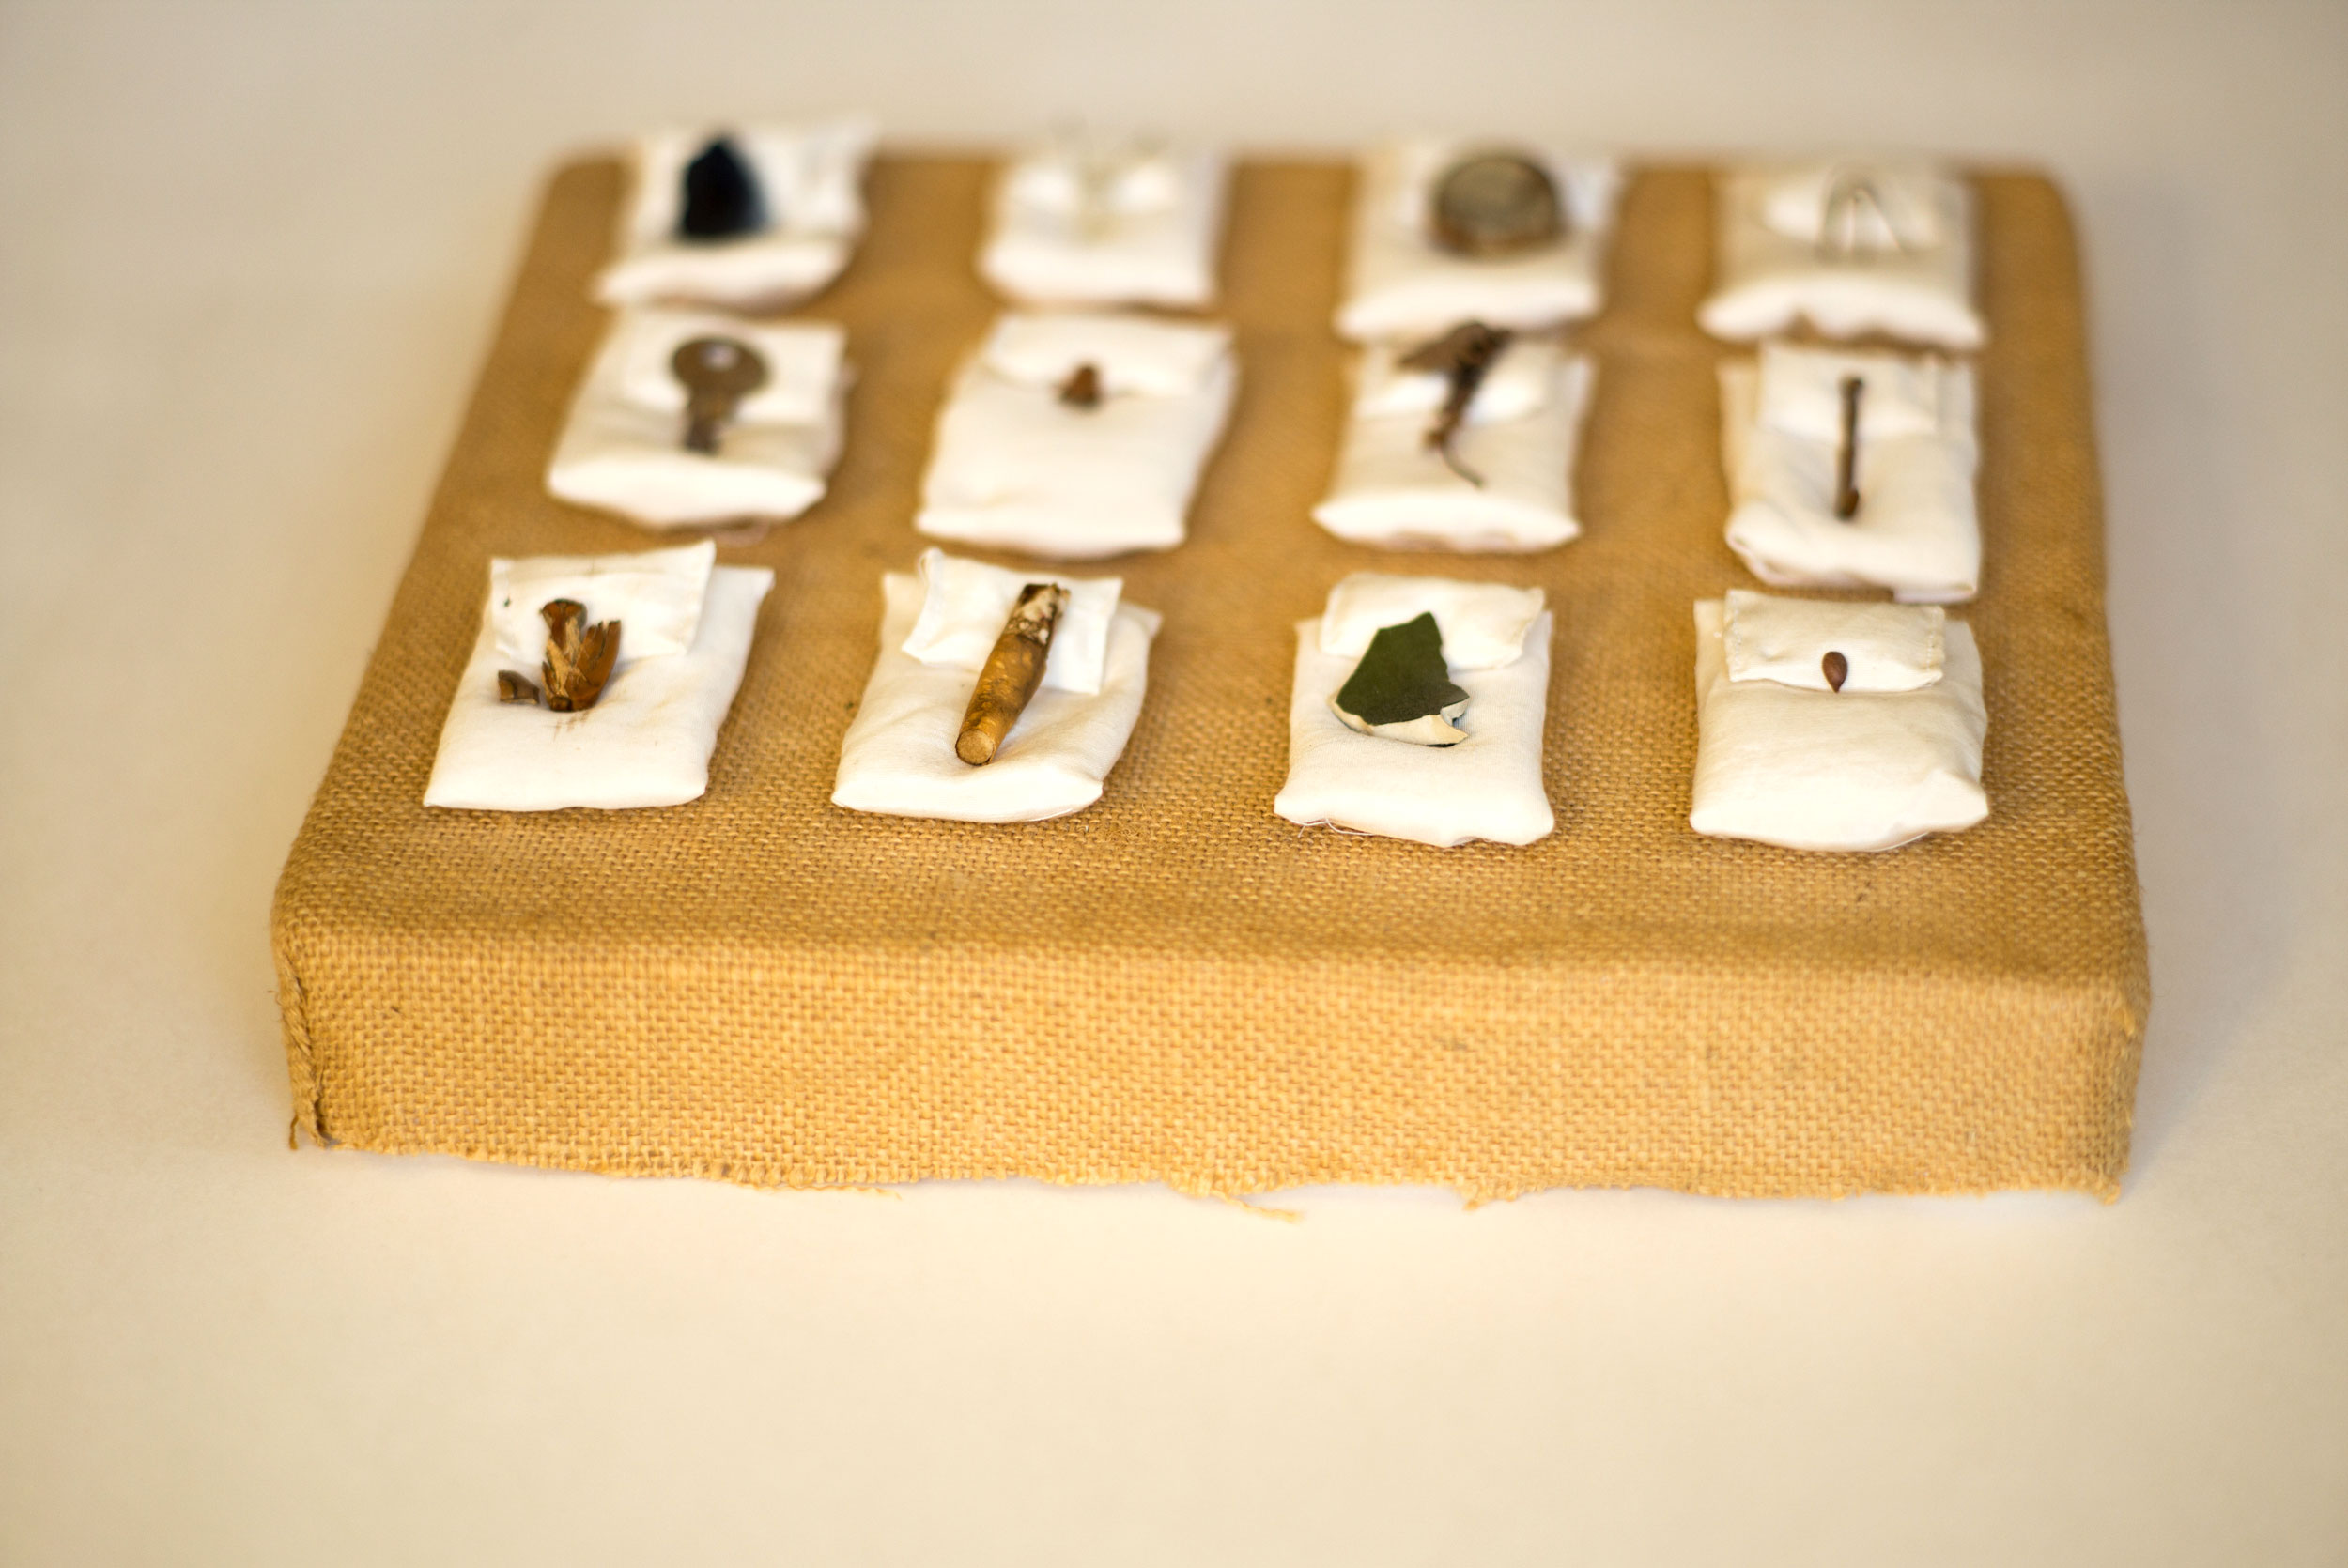 Grid-Board-When-is-the-Teatime_015.jpg